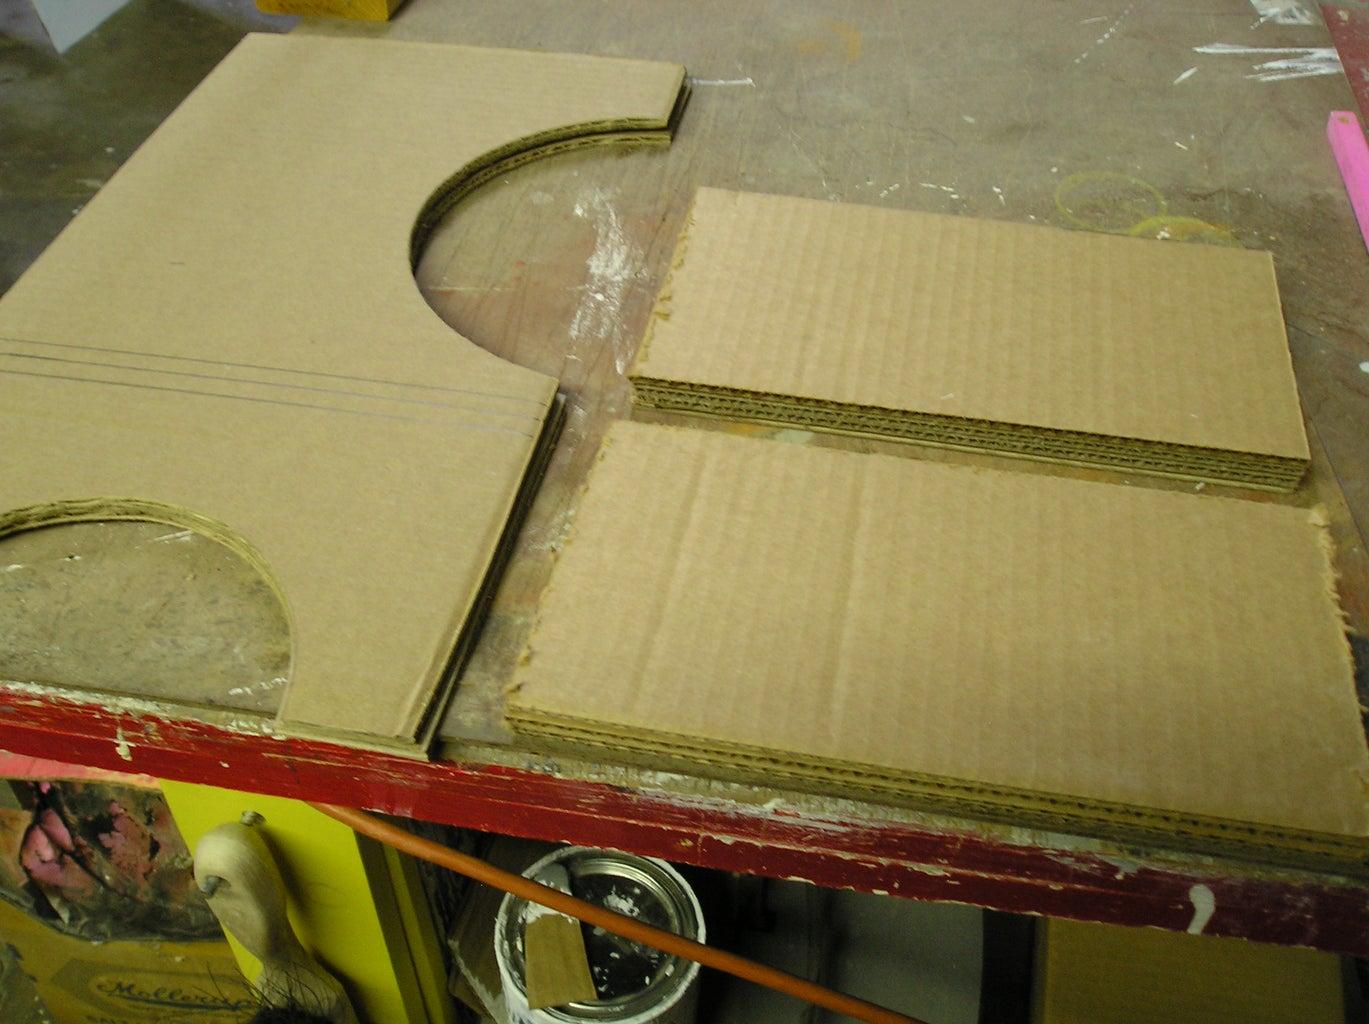 Design Is Transferred to Cardboard